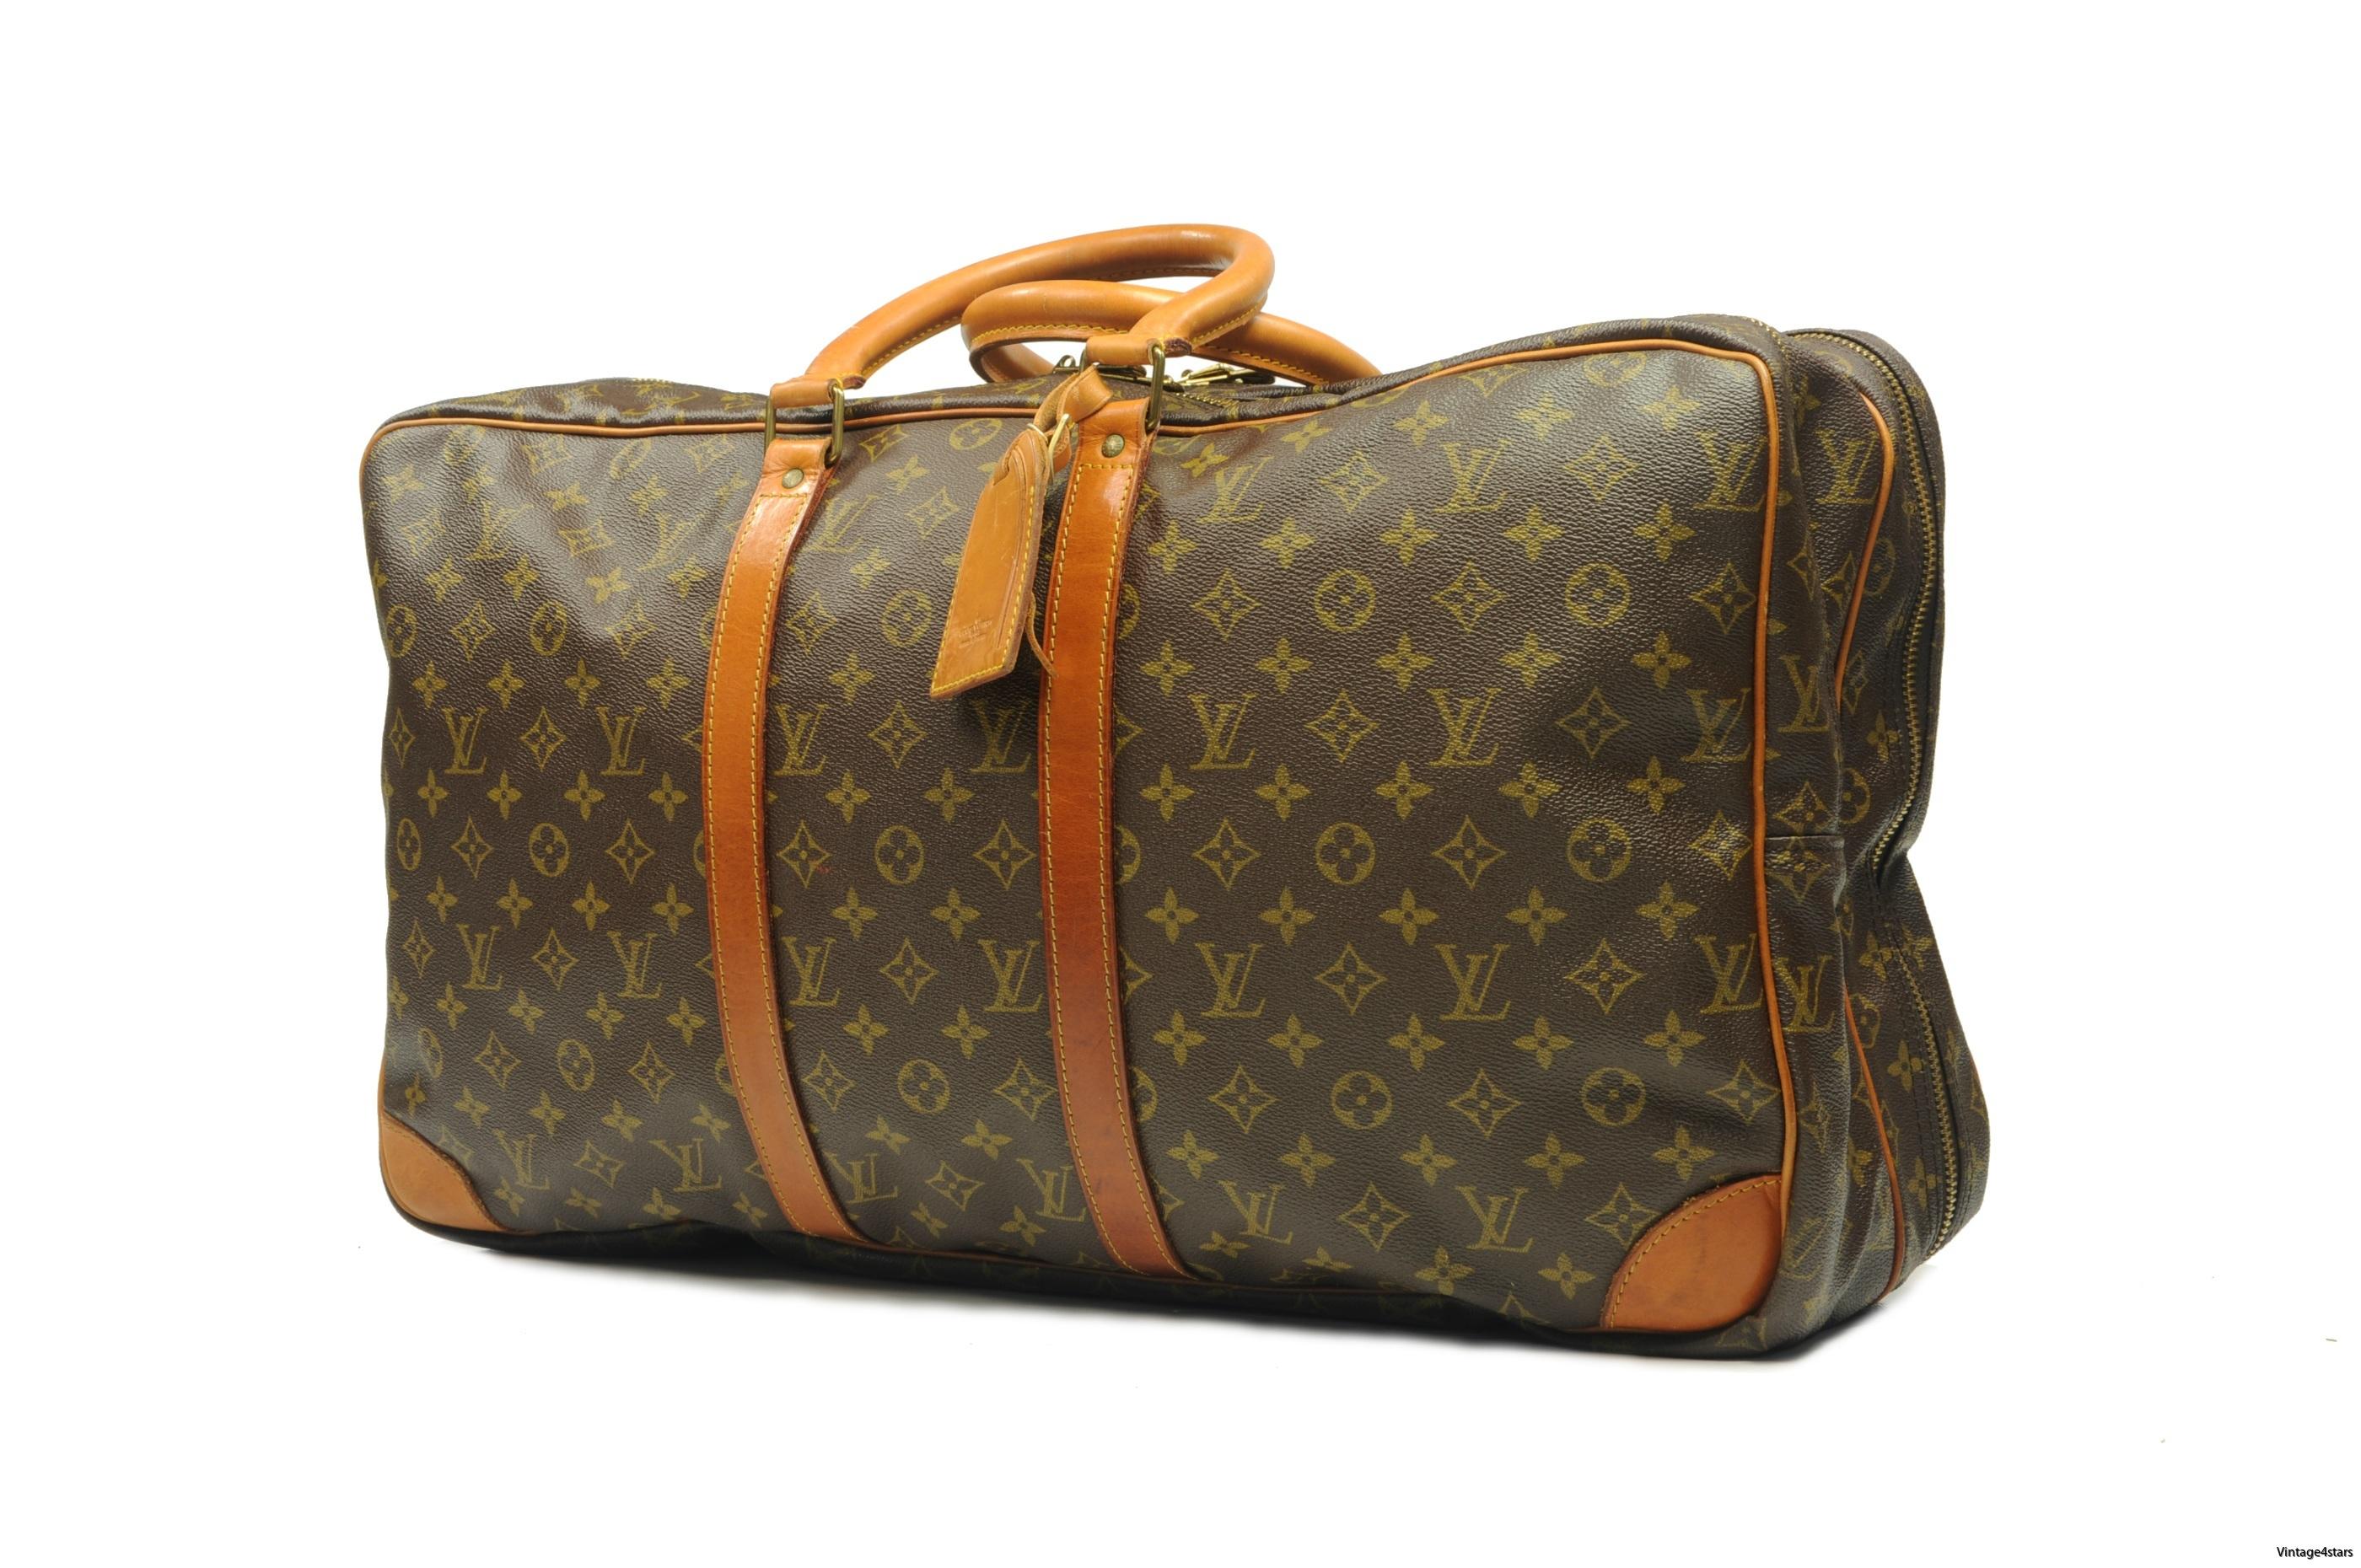 Louis Vuitton Sac 48 Heures 01